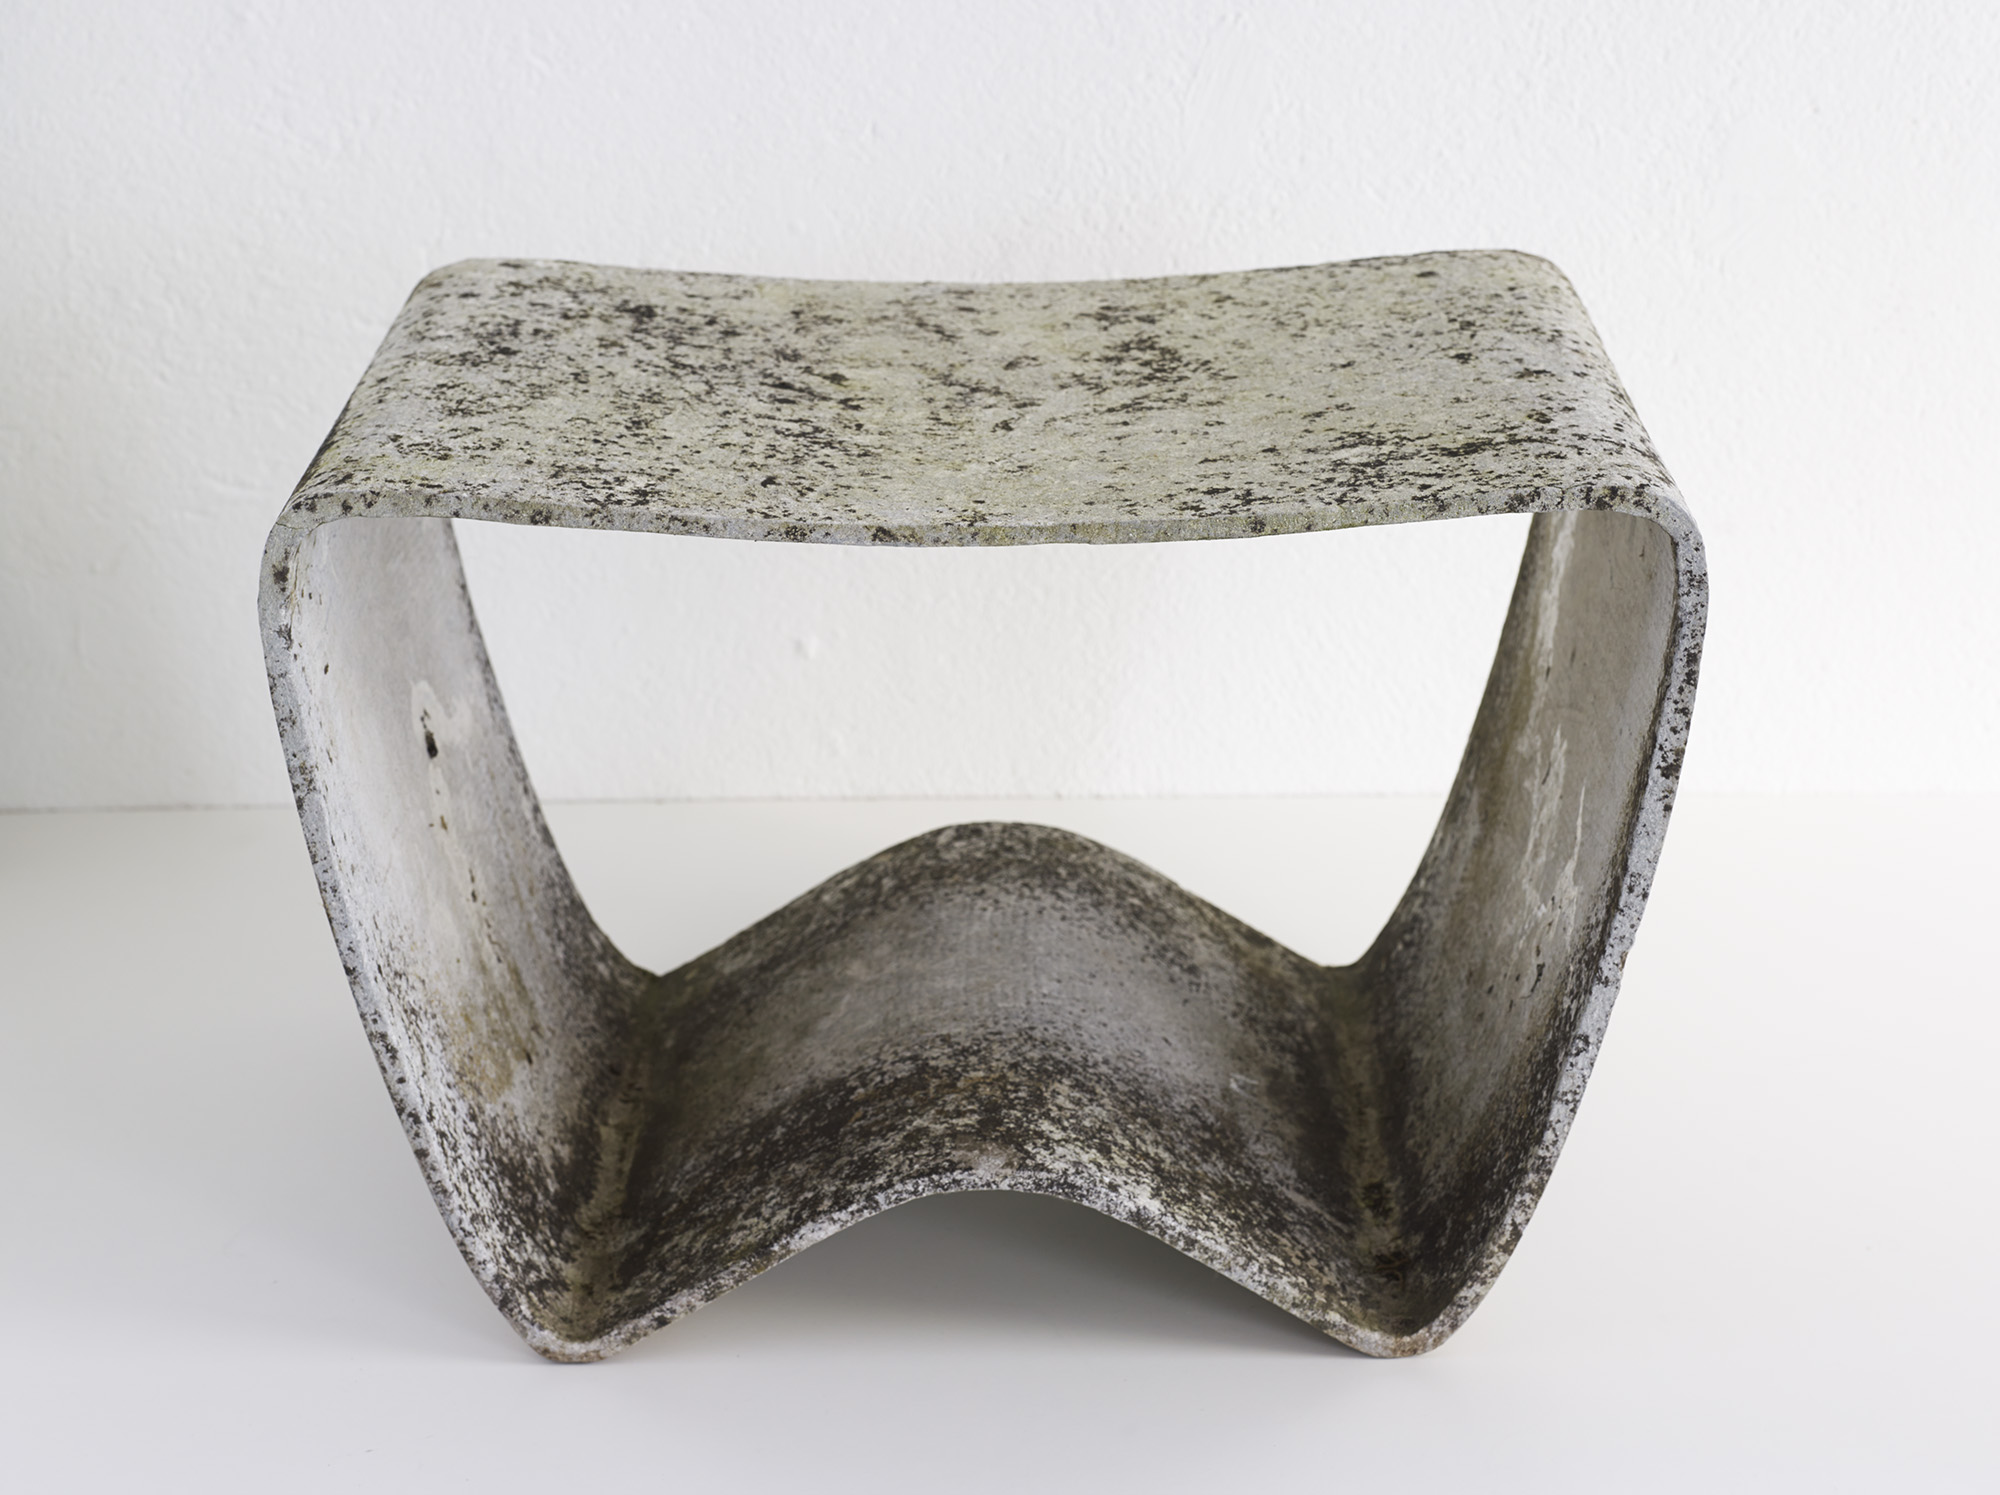 rare-stool-g59-11-by-ludwig-walser-image-09